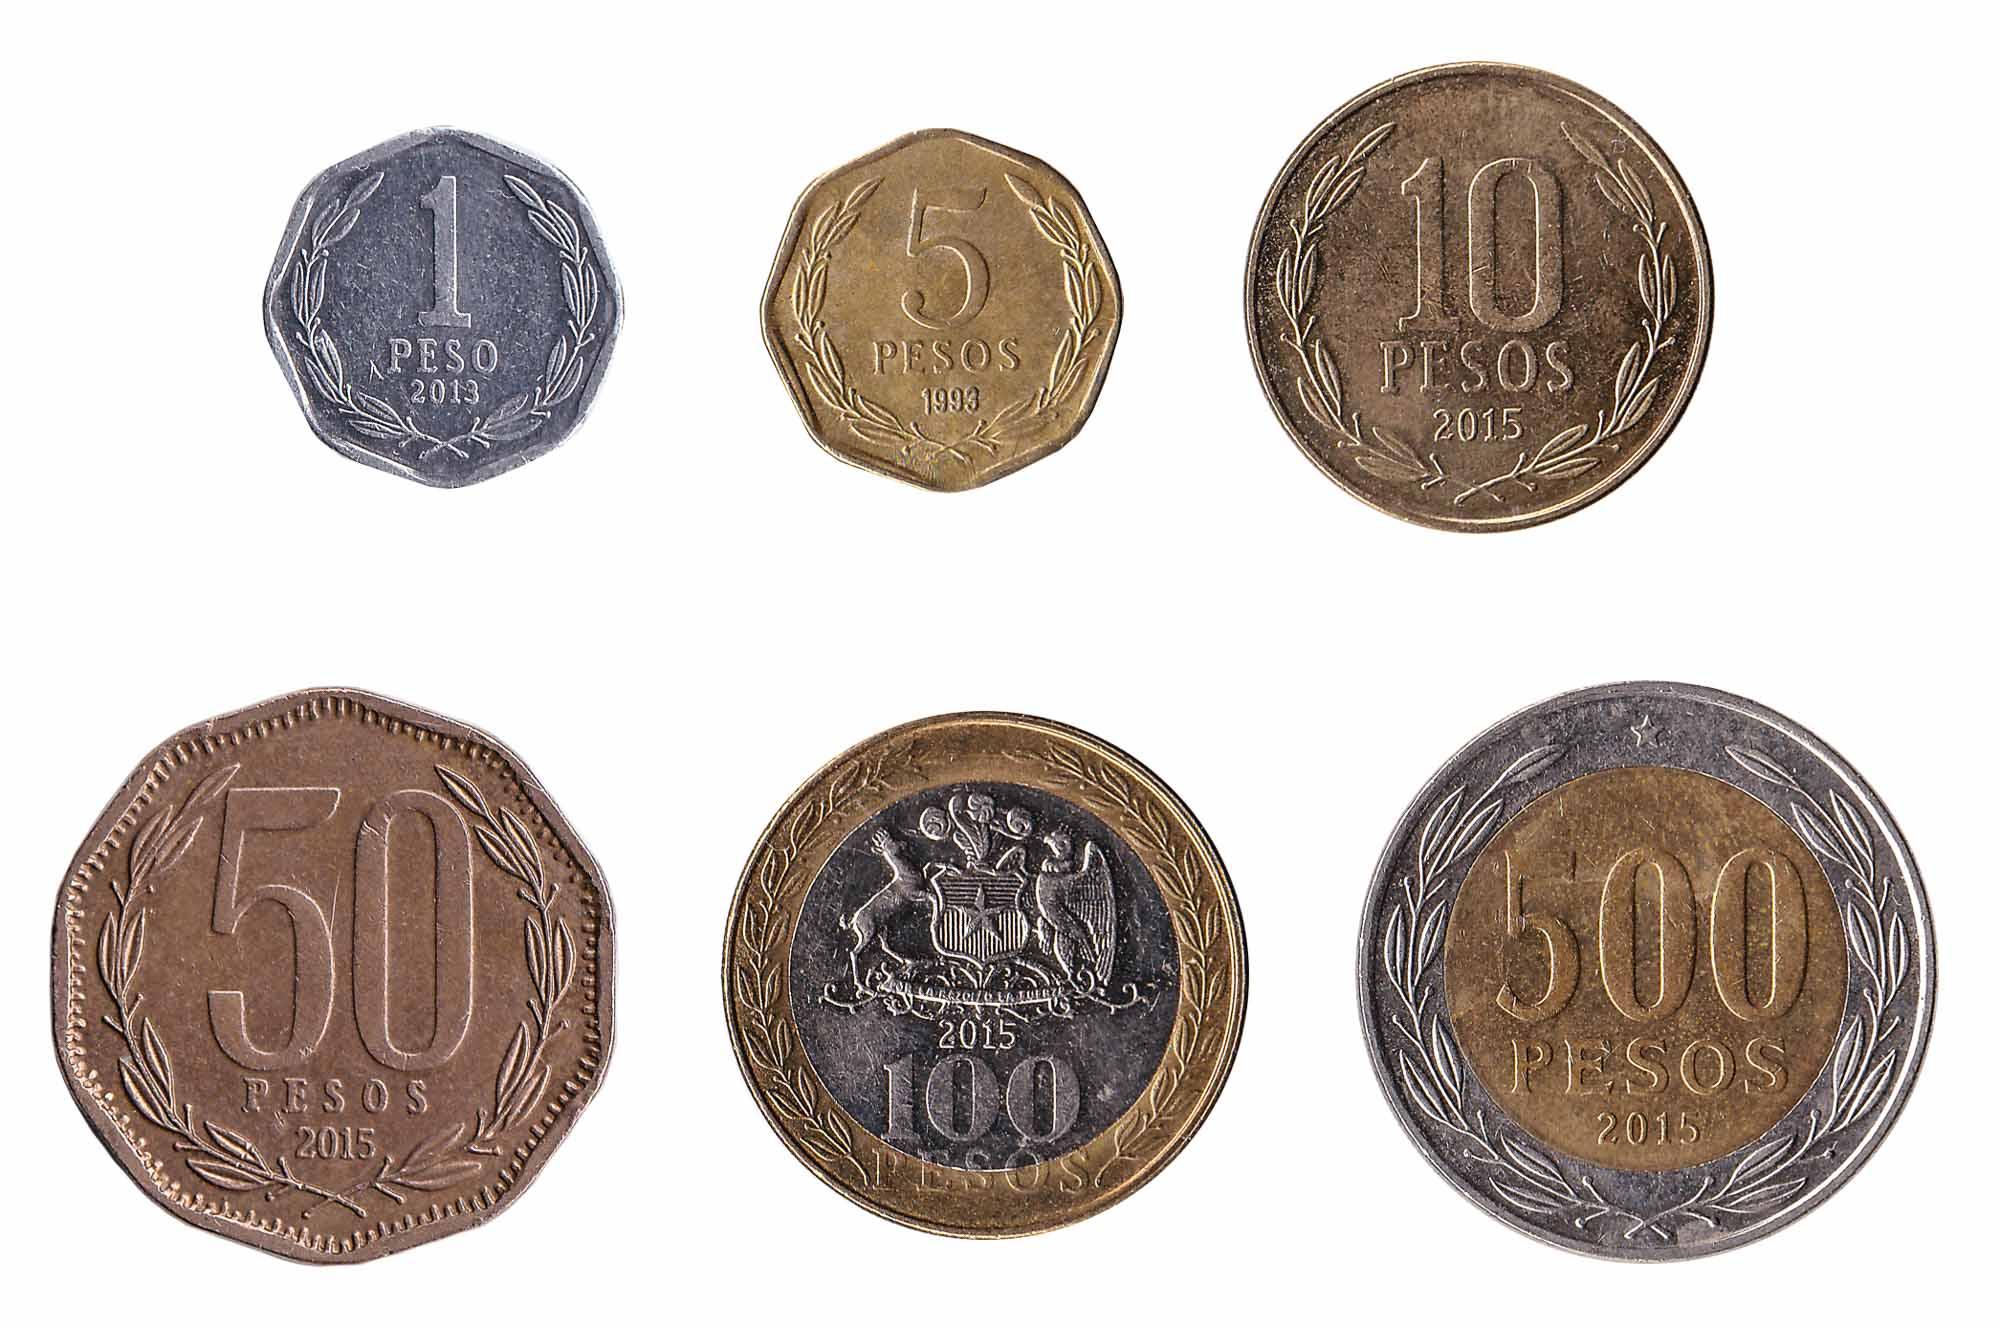 Chilean peso coins